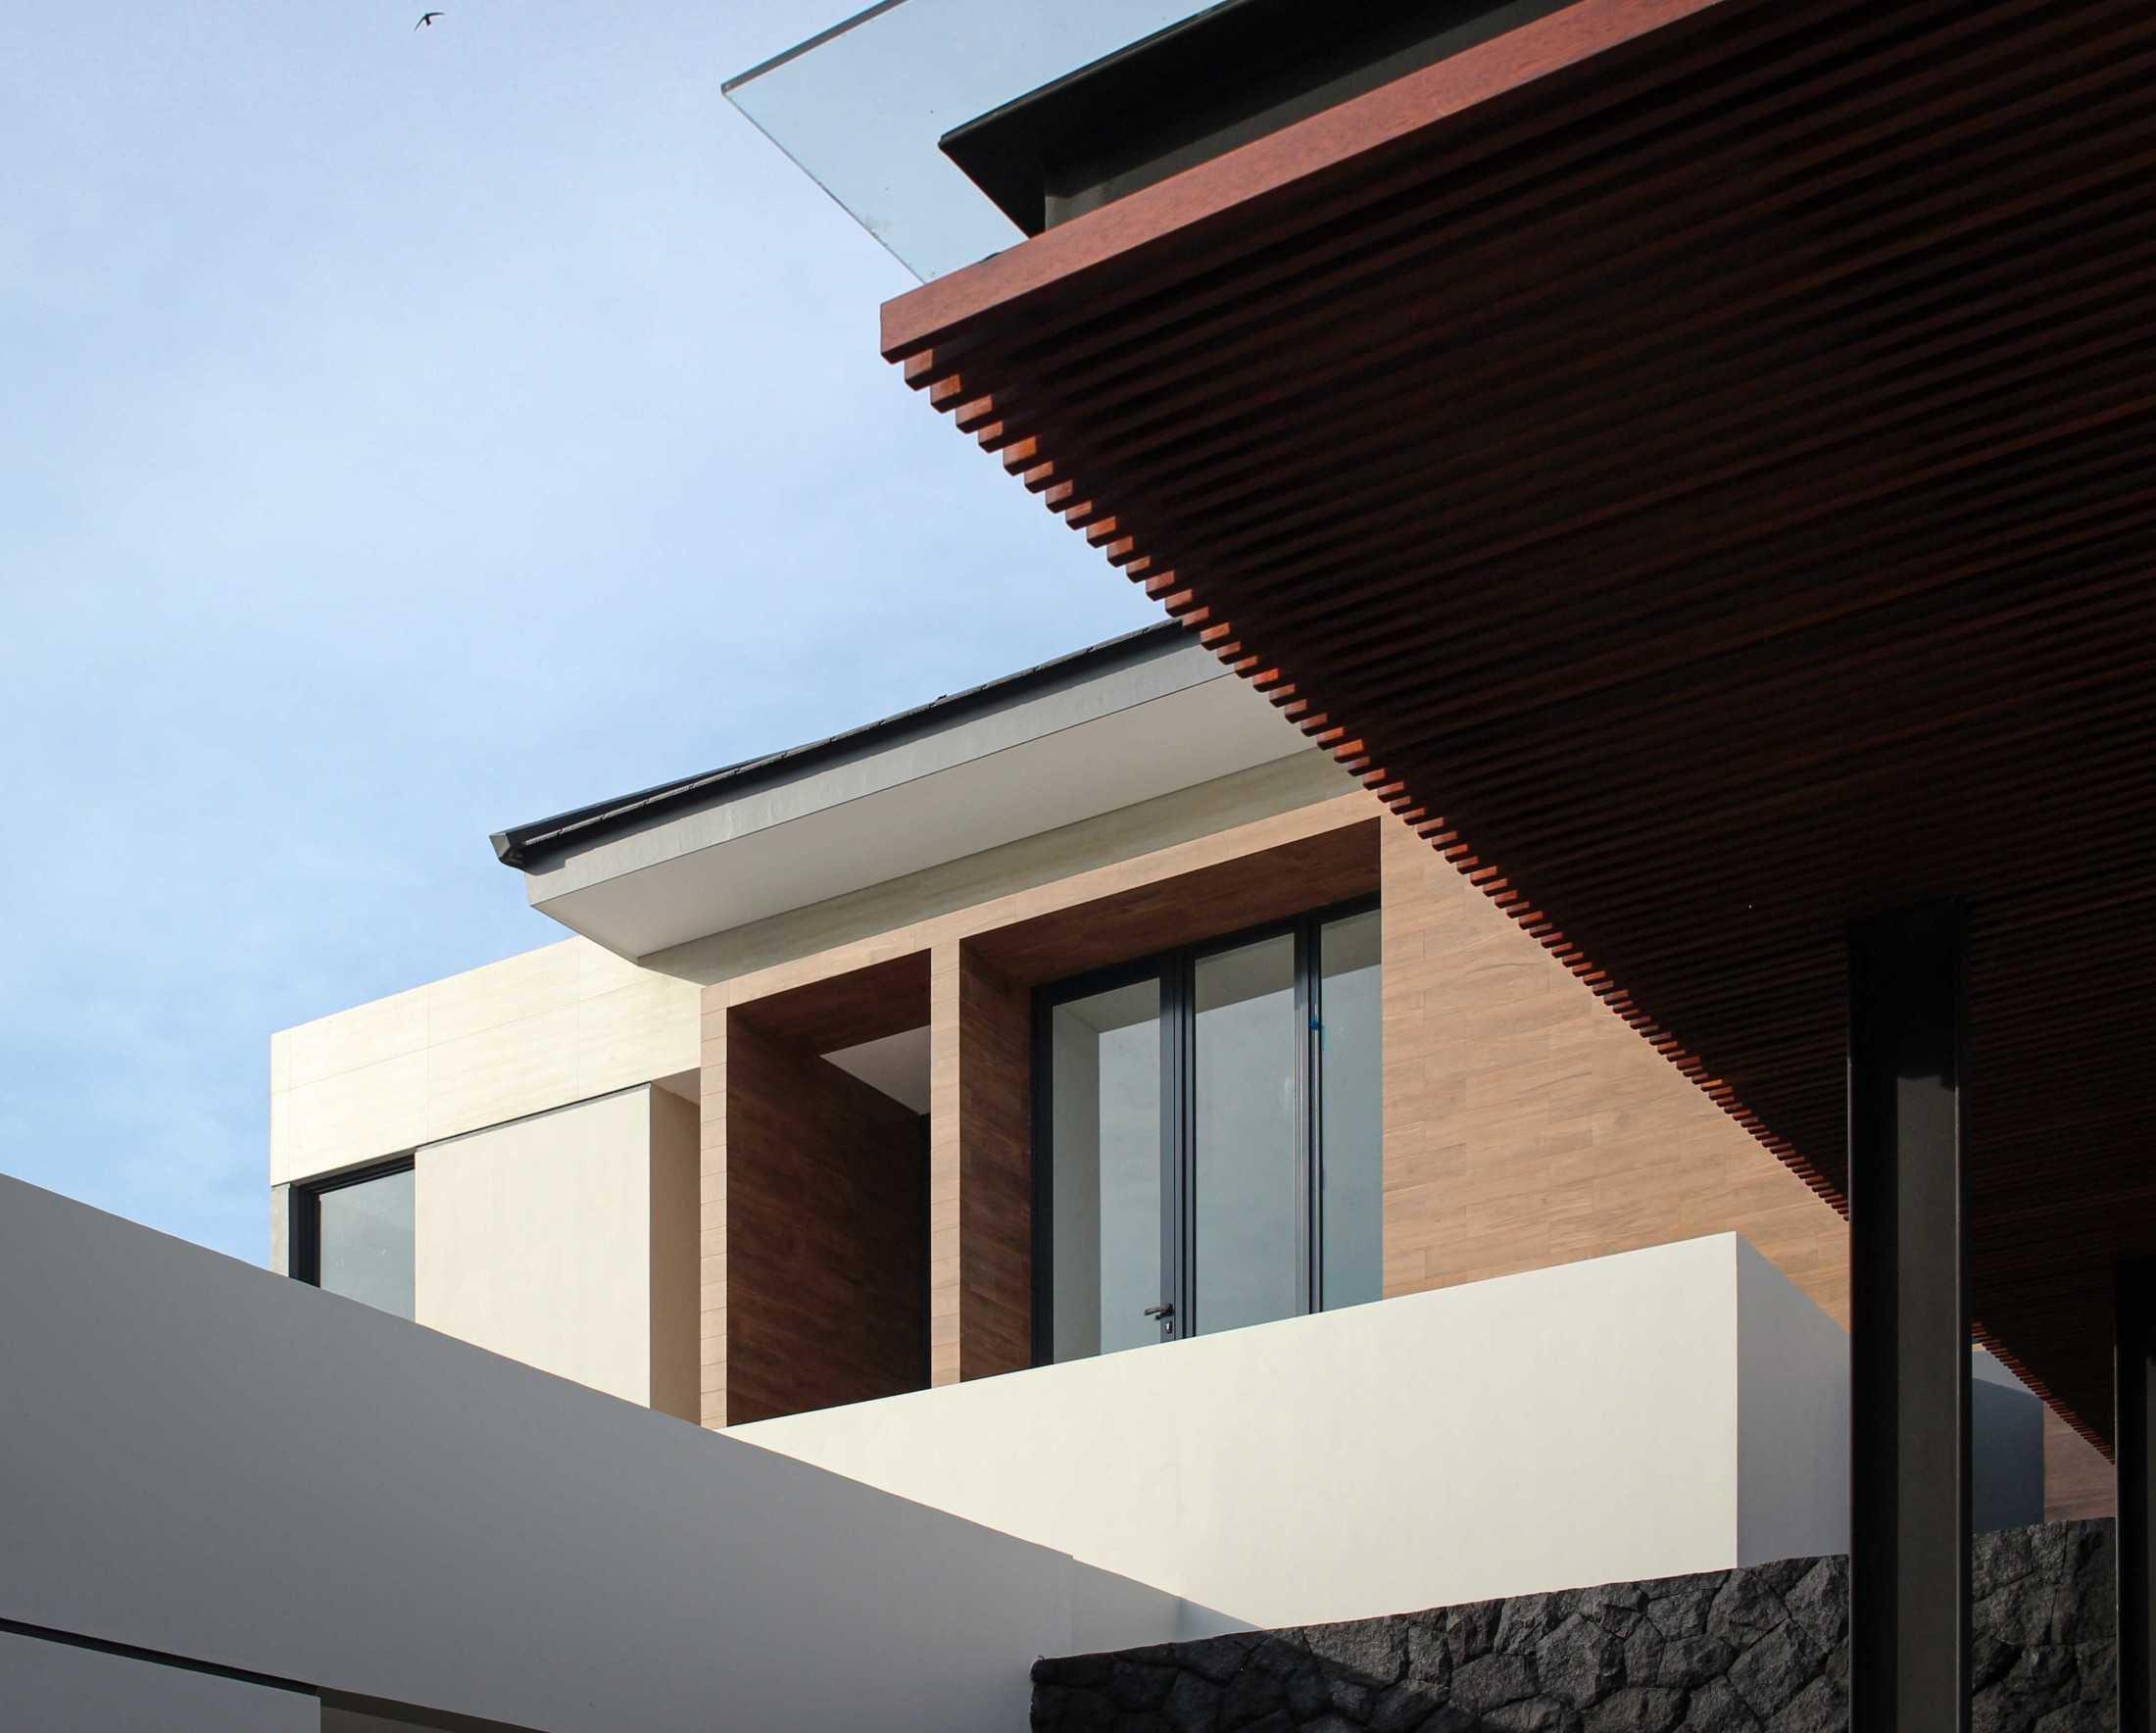 Y0 Design Architect S House Kec. Srono, Kabupaten Banyuwangi, Jawa Timur, Indonesia Kec. Srono, Kabupaten Banyuwangi, Jawa Timur, Indonesia Yohanes-Iswara-Limandjaya-S-House  121064